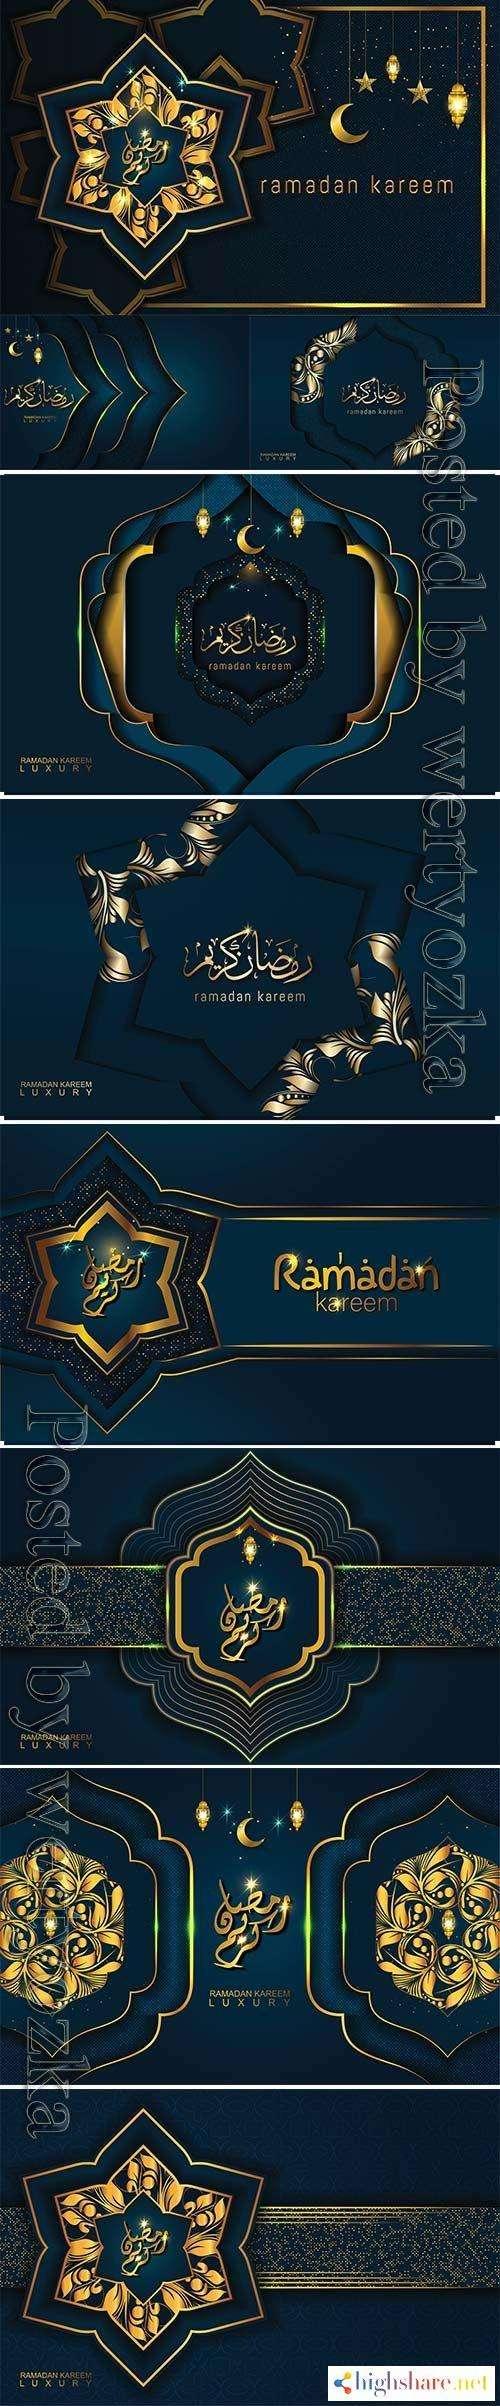 ramadan kareem in luxury style with arabic calligraphy 5f4384117f9c3 - Ramadan Kareem in luxury style with arabic calligraphy